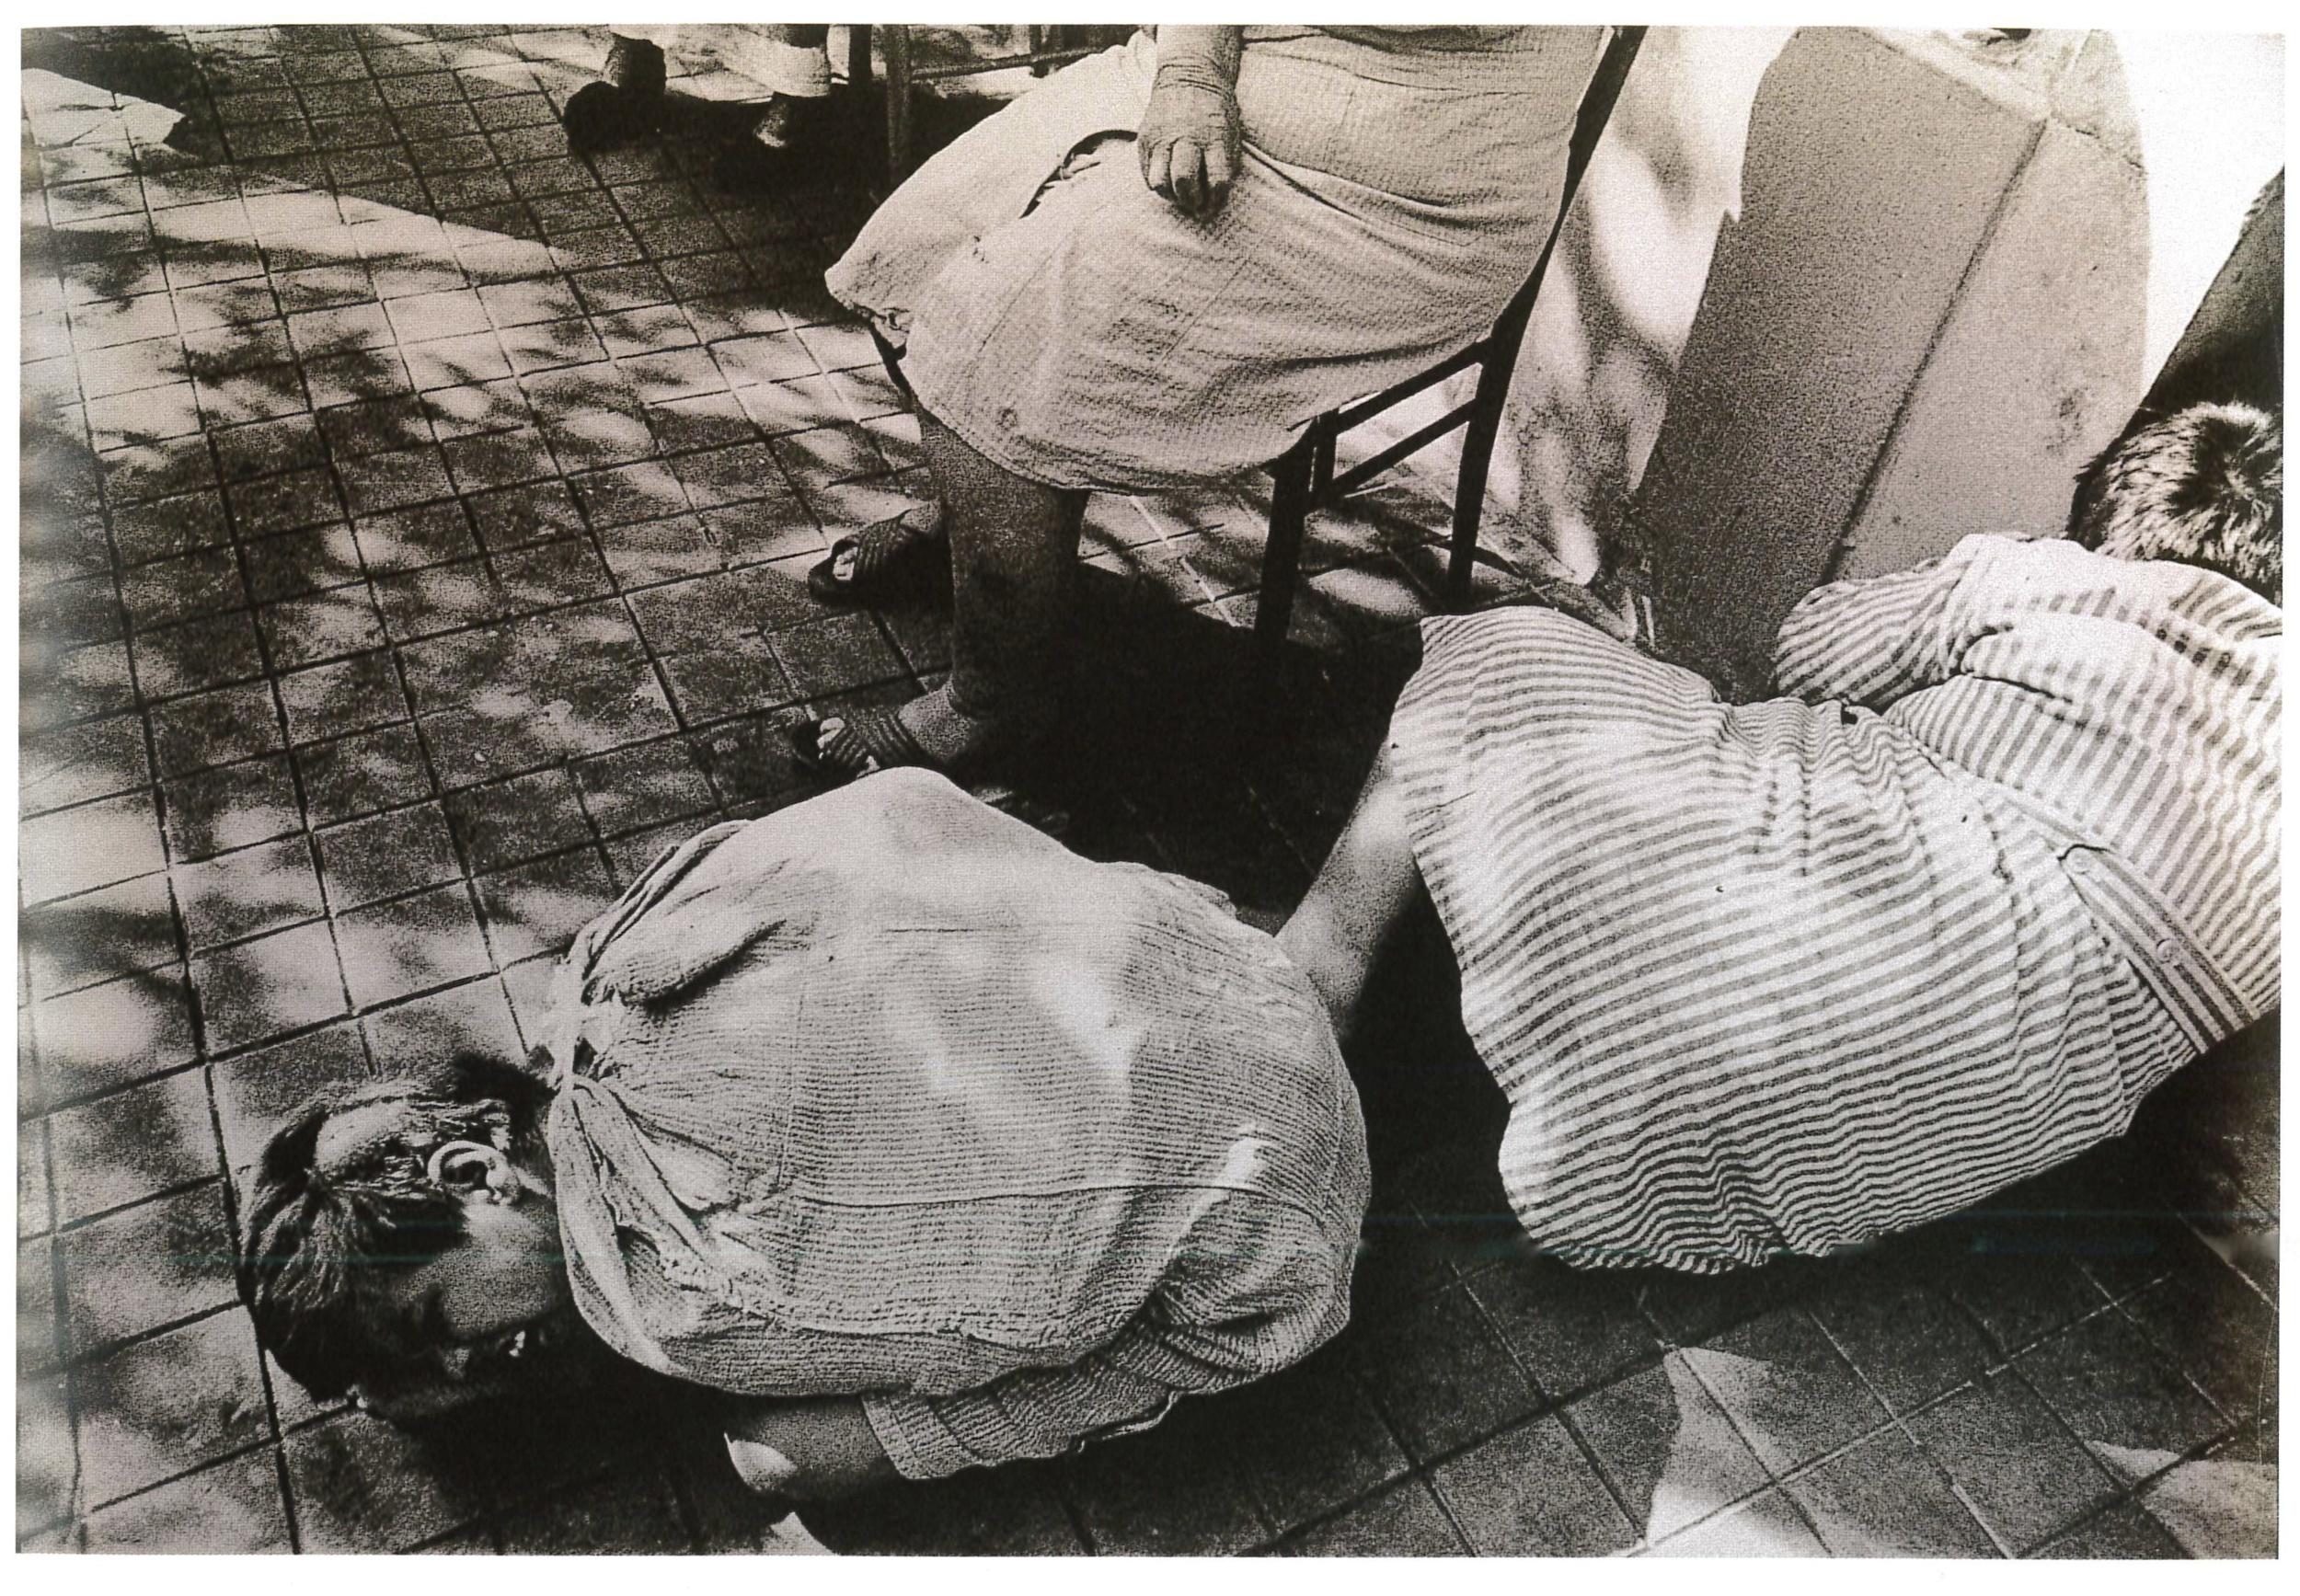 Ospedale psichiatrico. Firenze, 1968.